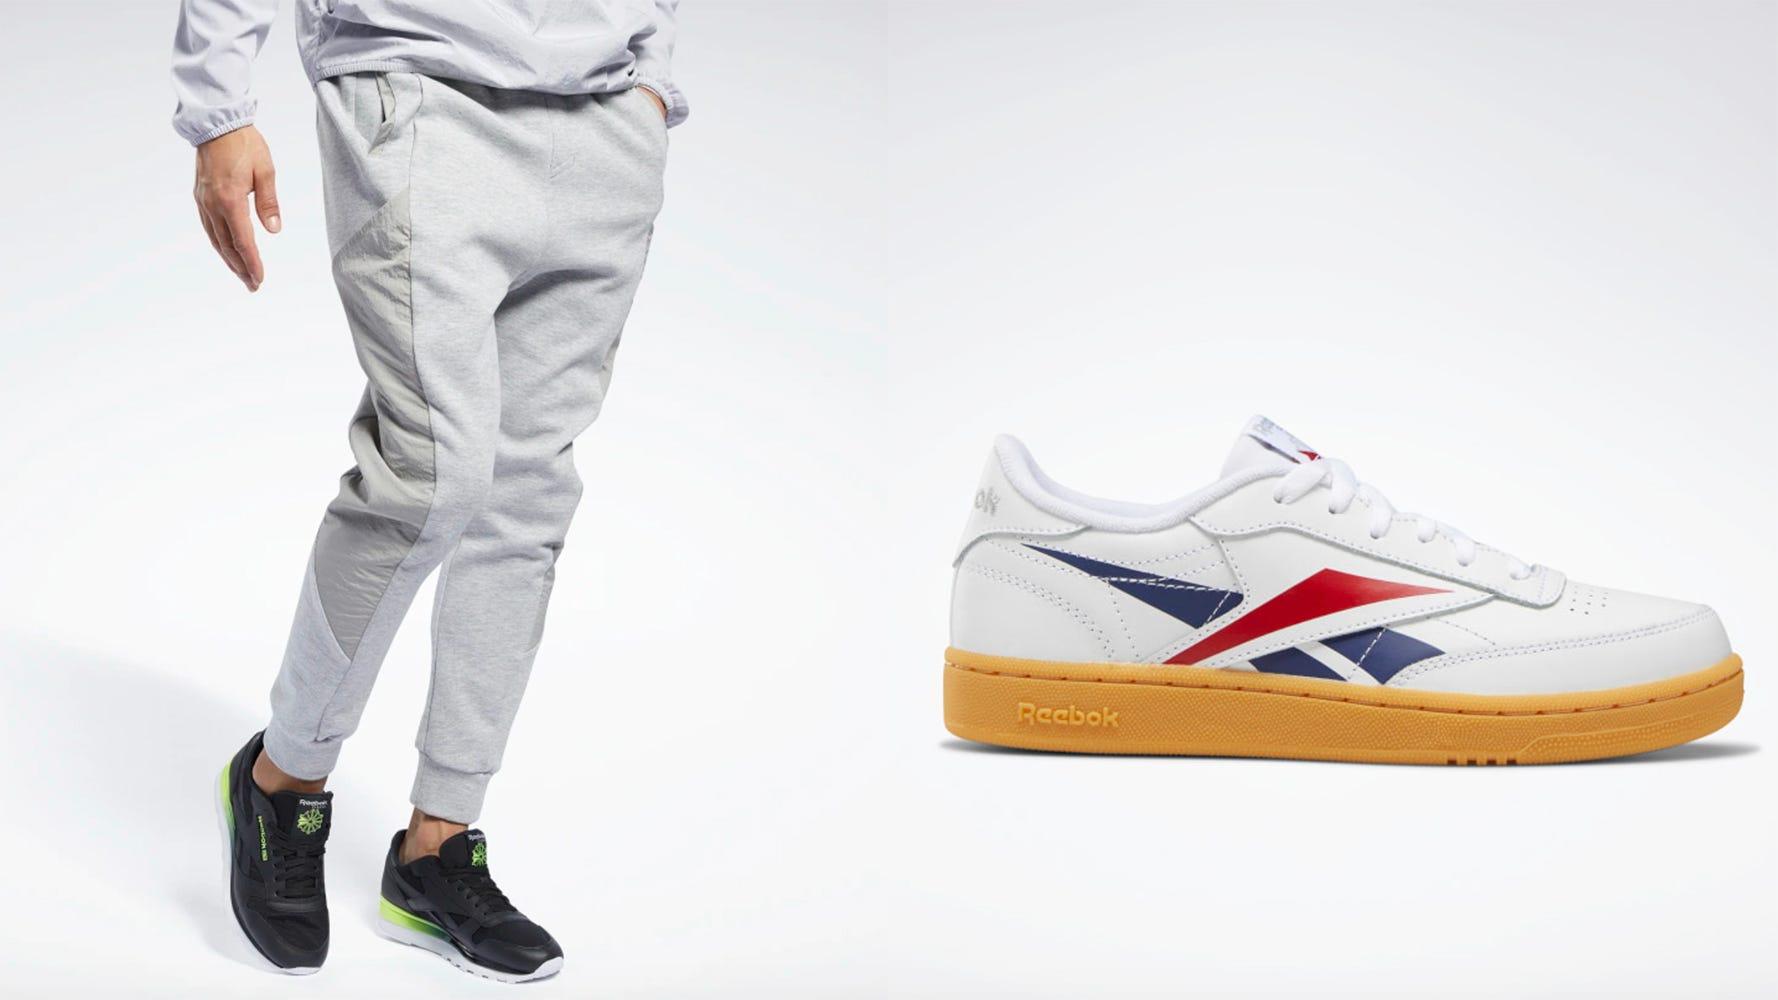 Reebok sale: Save on select sneakers